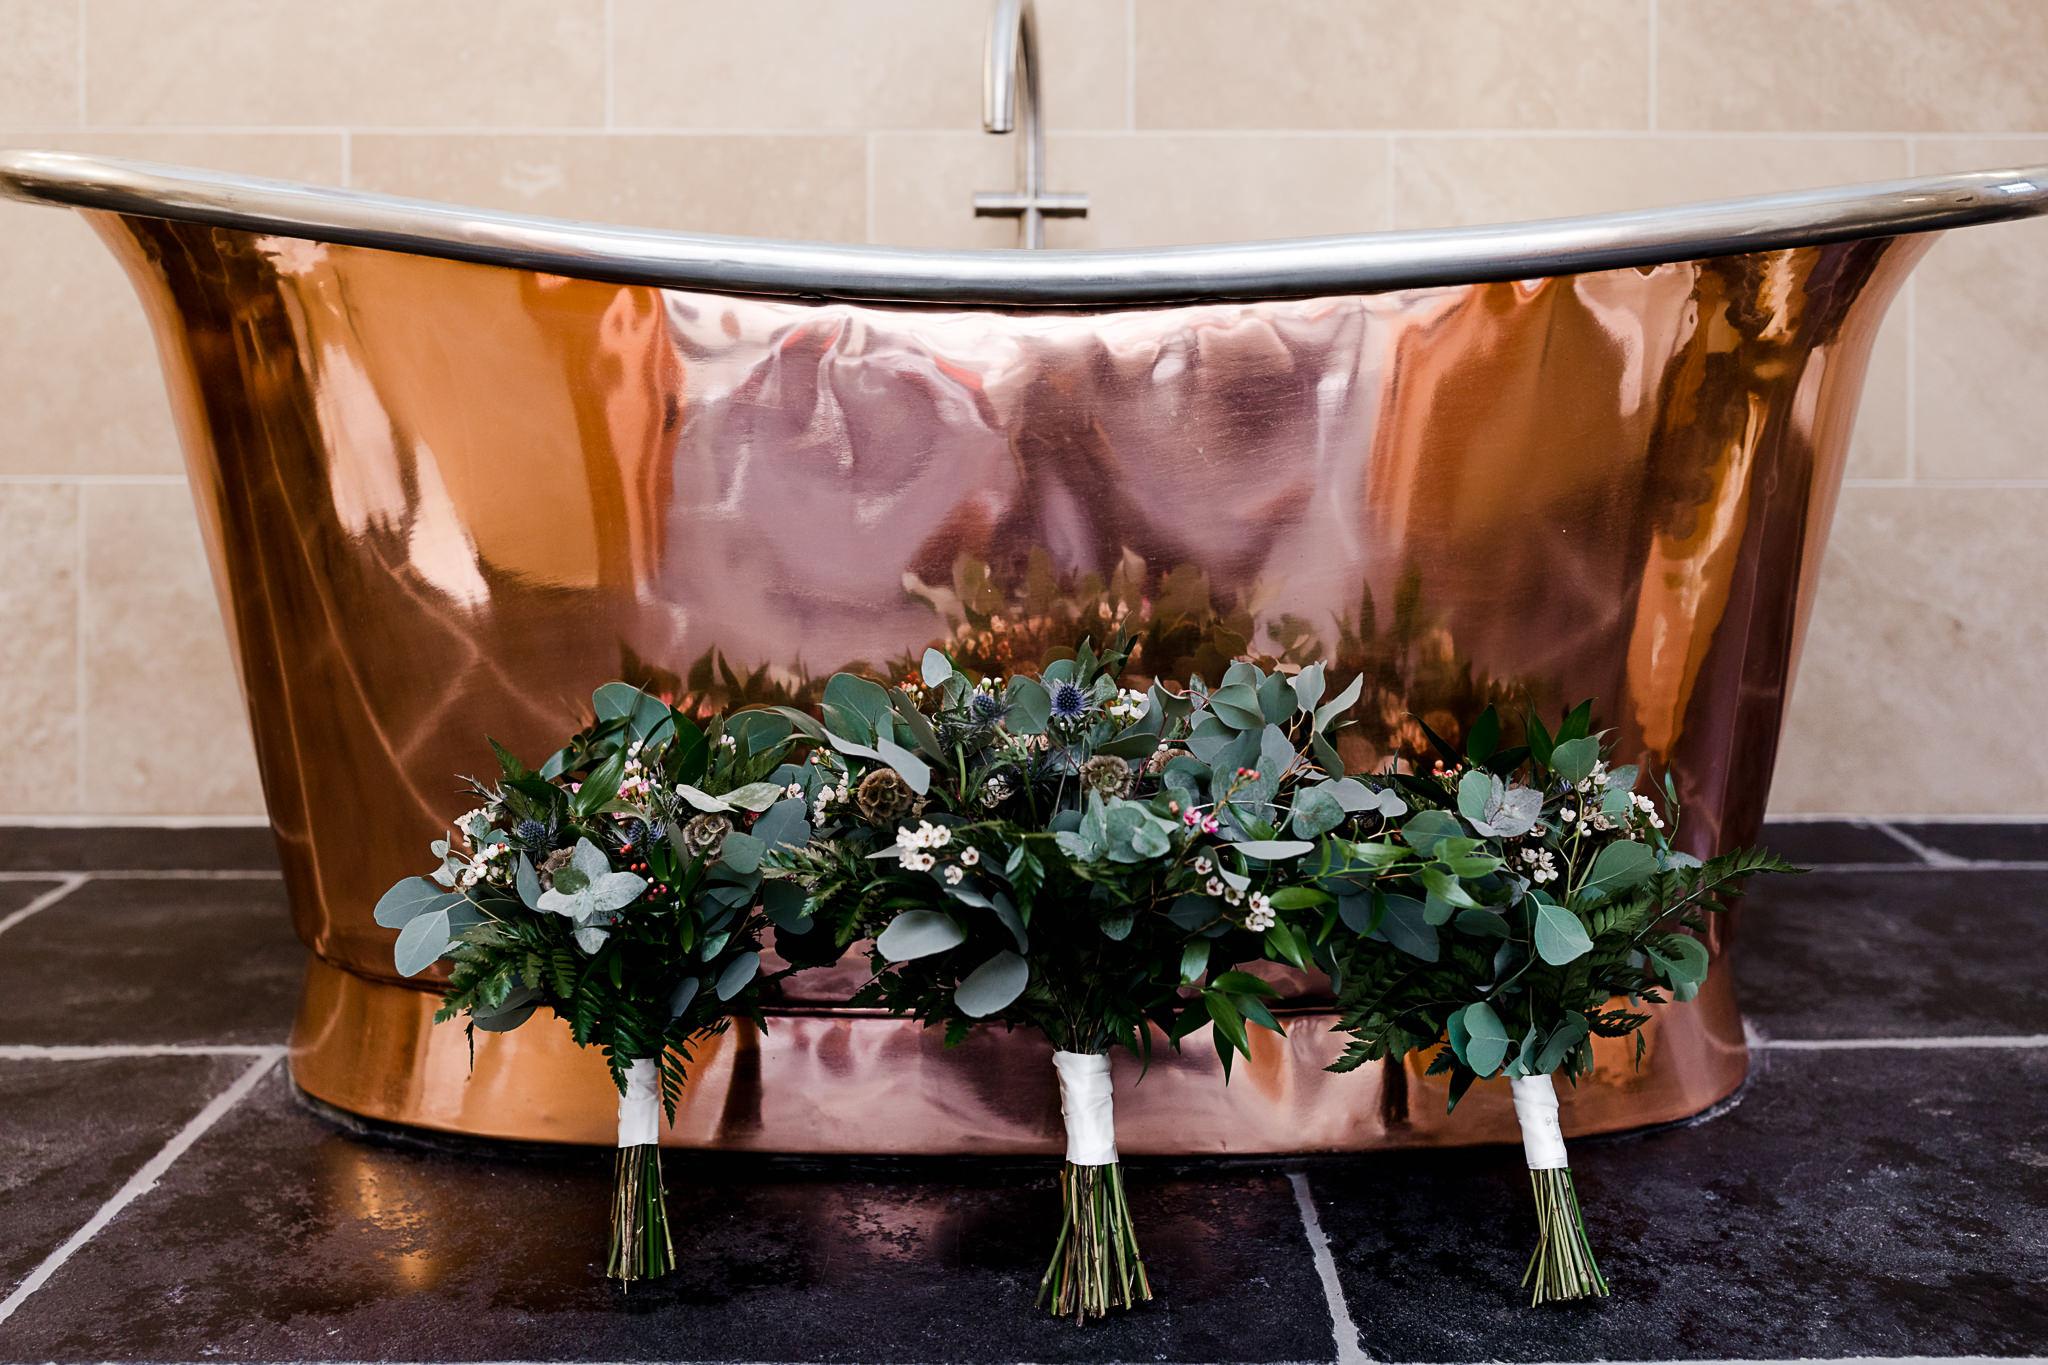 The Gathering Barn Wedding - Art by Design Photography - Wedding flowers